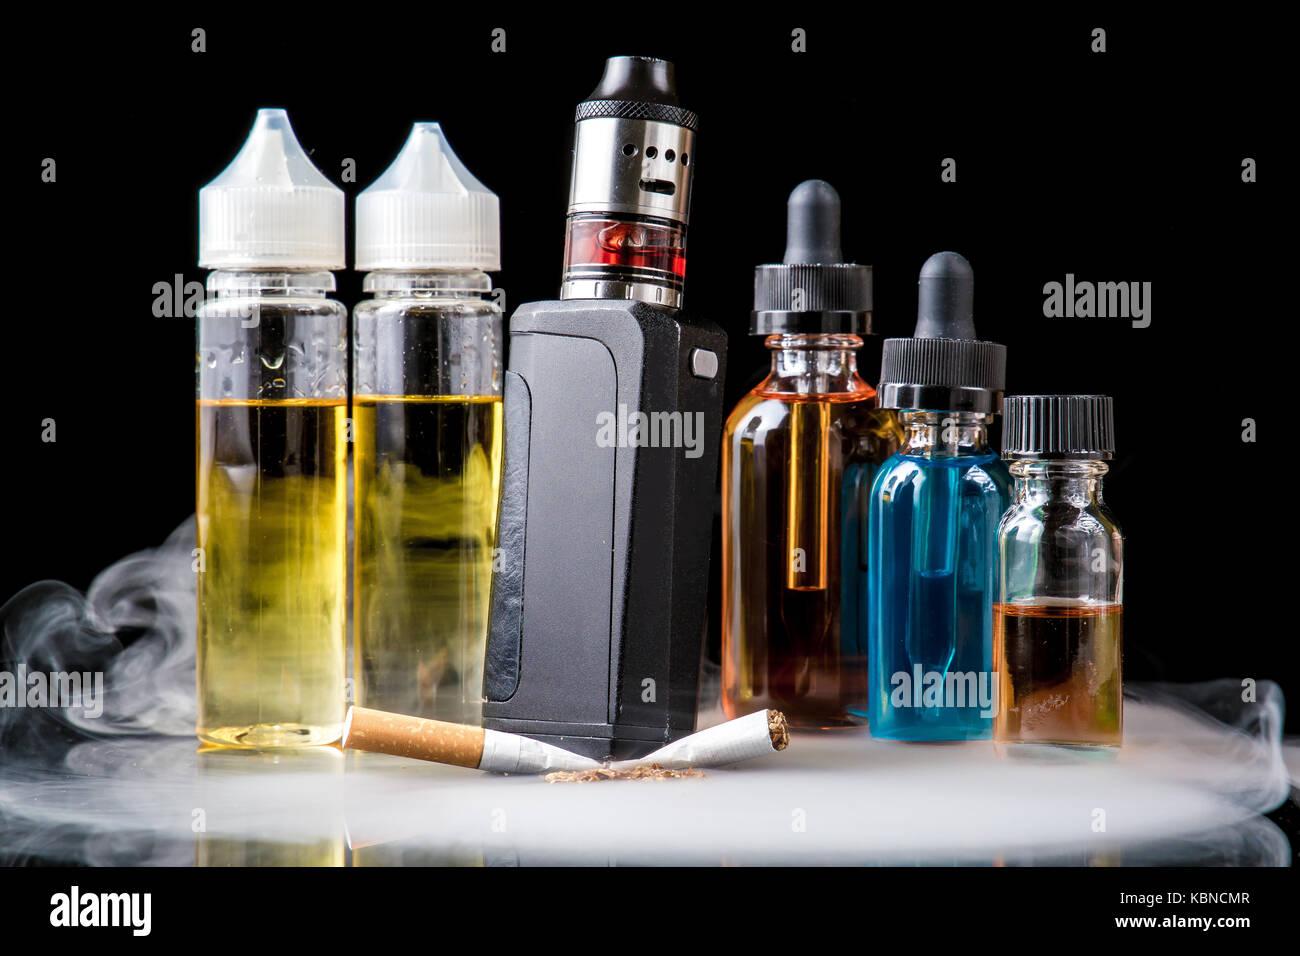 Modern vaporiser versus old tobacco cigarette in smoke - Stock Image